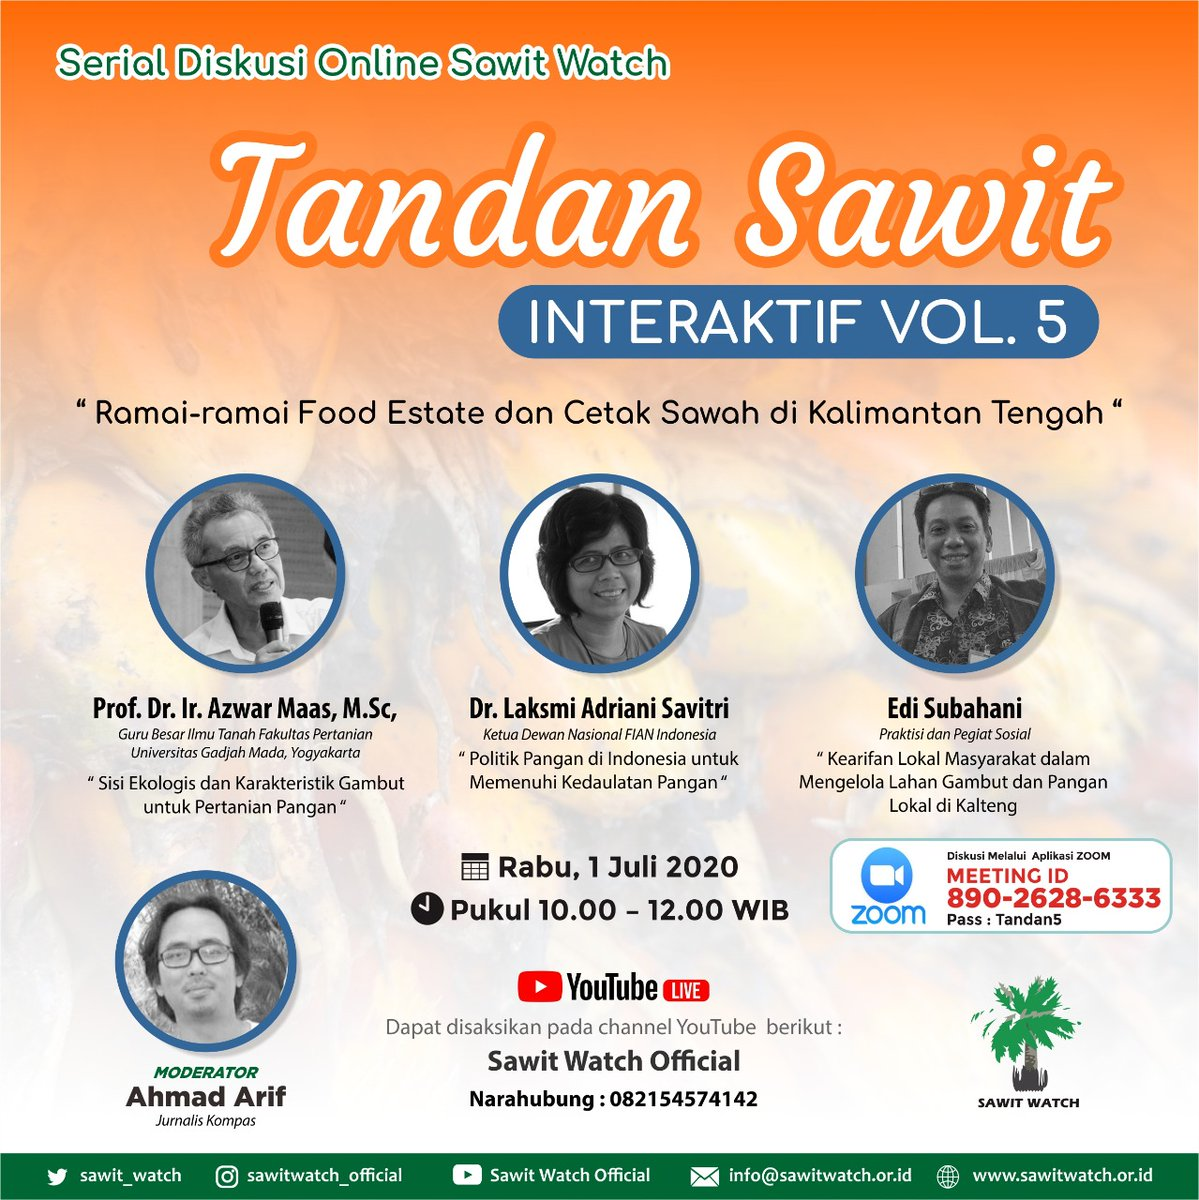 "Coming Soon  Diskusi Online Tandan Sawit Vol. 5 ""Ramai-ramai Food Esatate dan Cetak Sawah di Kalimantan Tengah"". Rabu 1 Juli 2020 pukul 10.00 WIB via Zoom. https://t.co/uz4i28LMio"